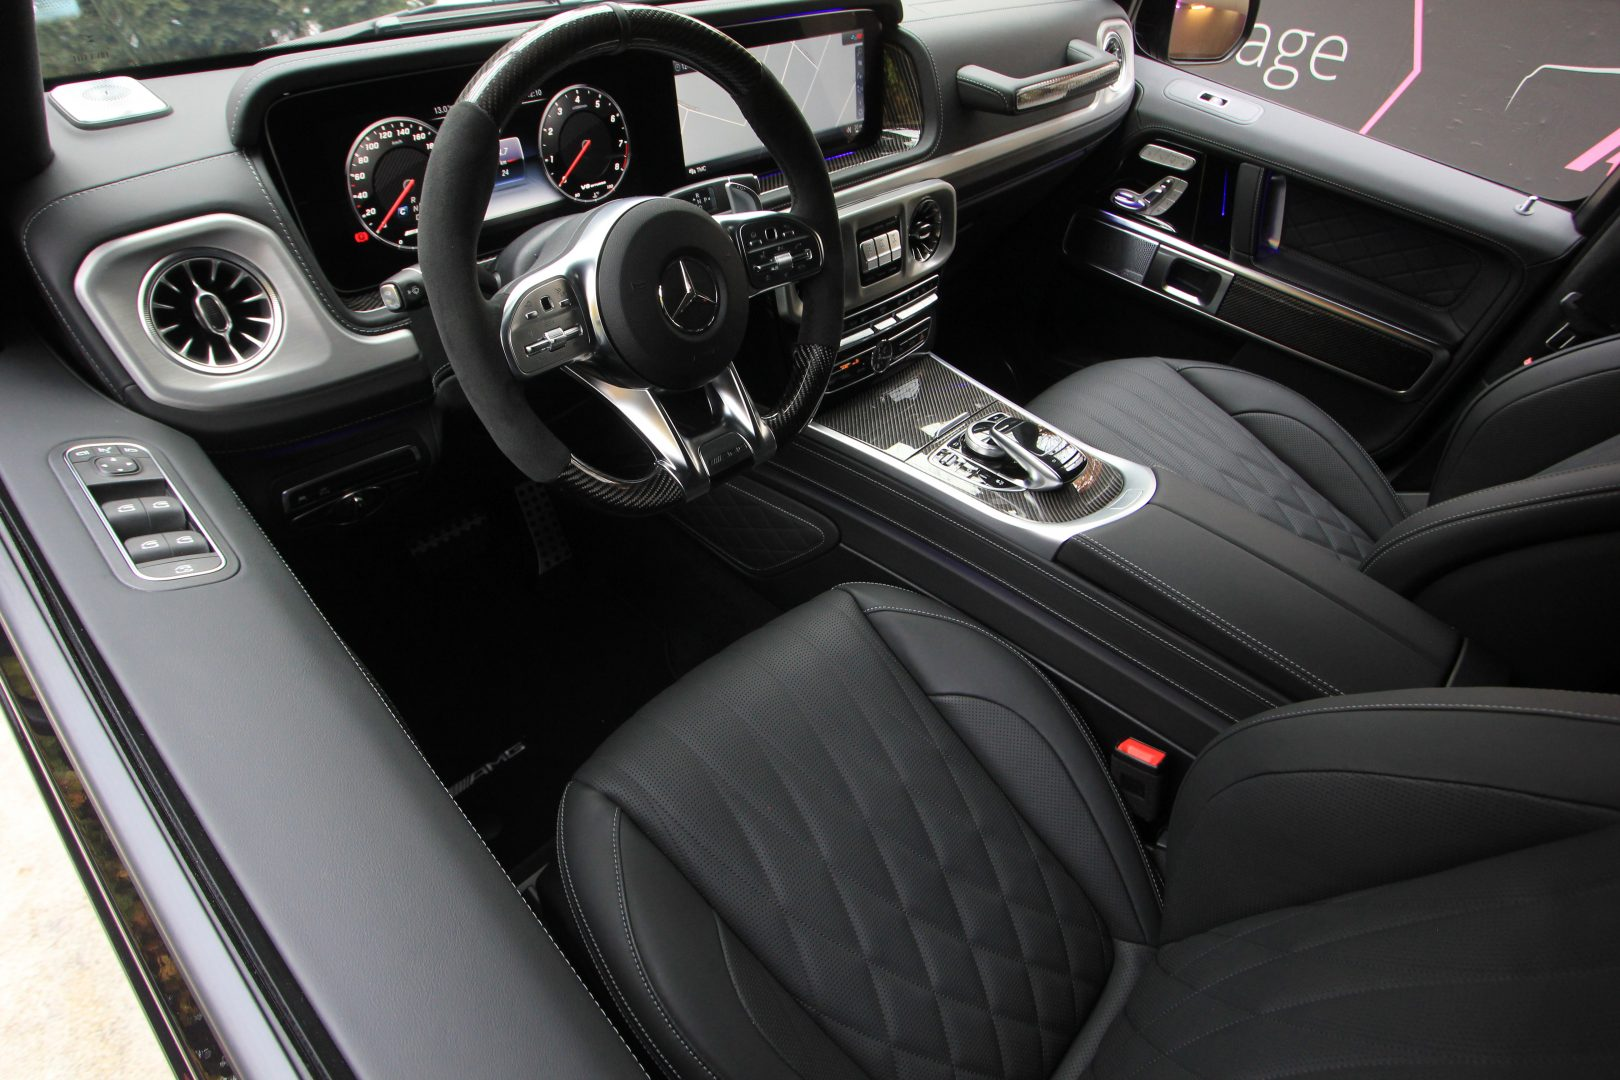 AIL Mercedes-Benz G 63 AMG Carbon Paket Burmester 4